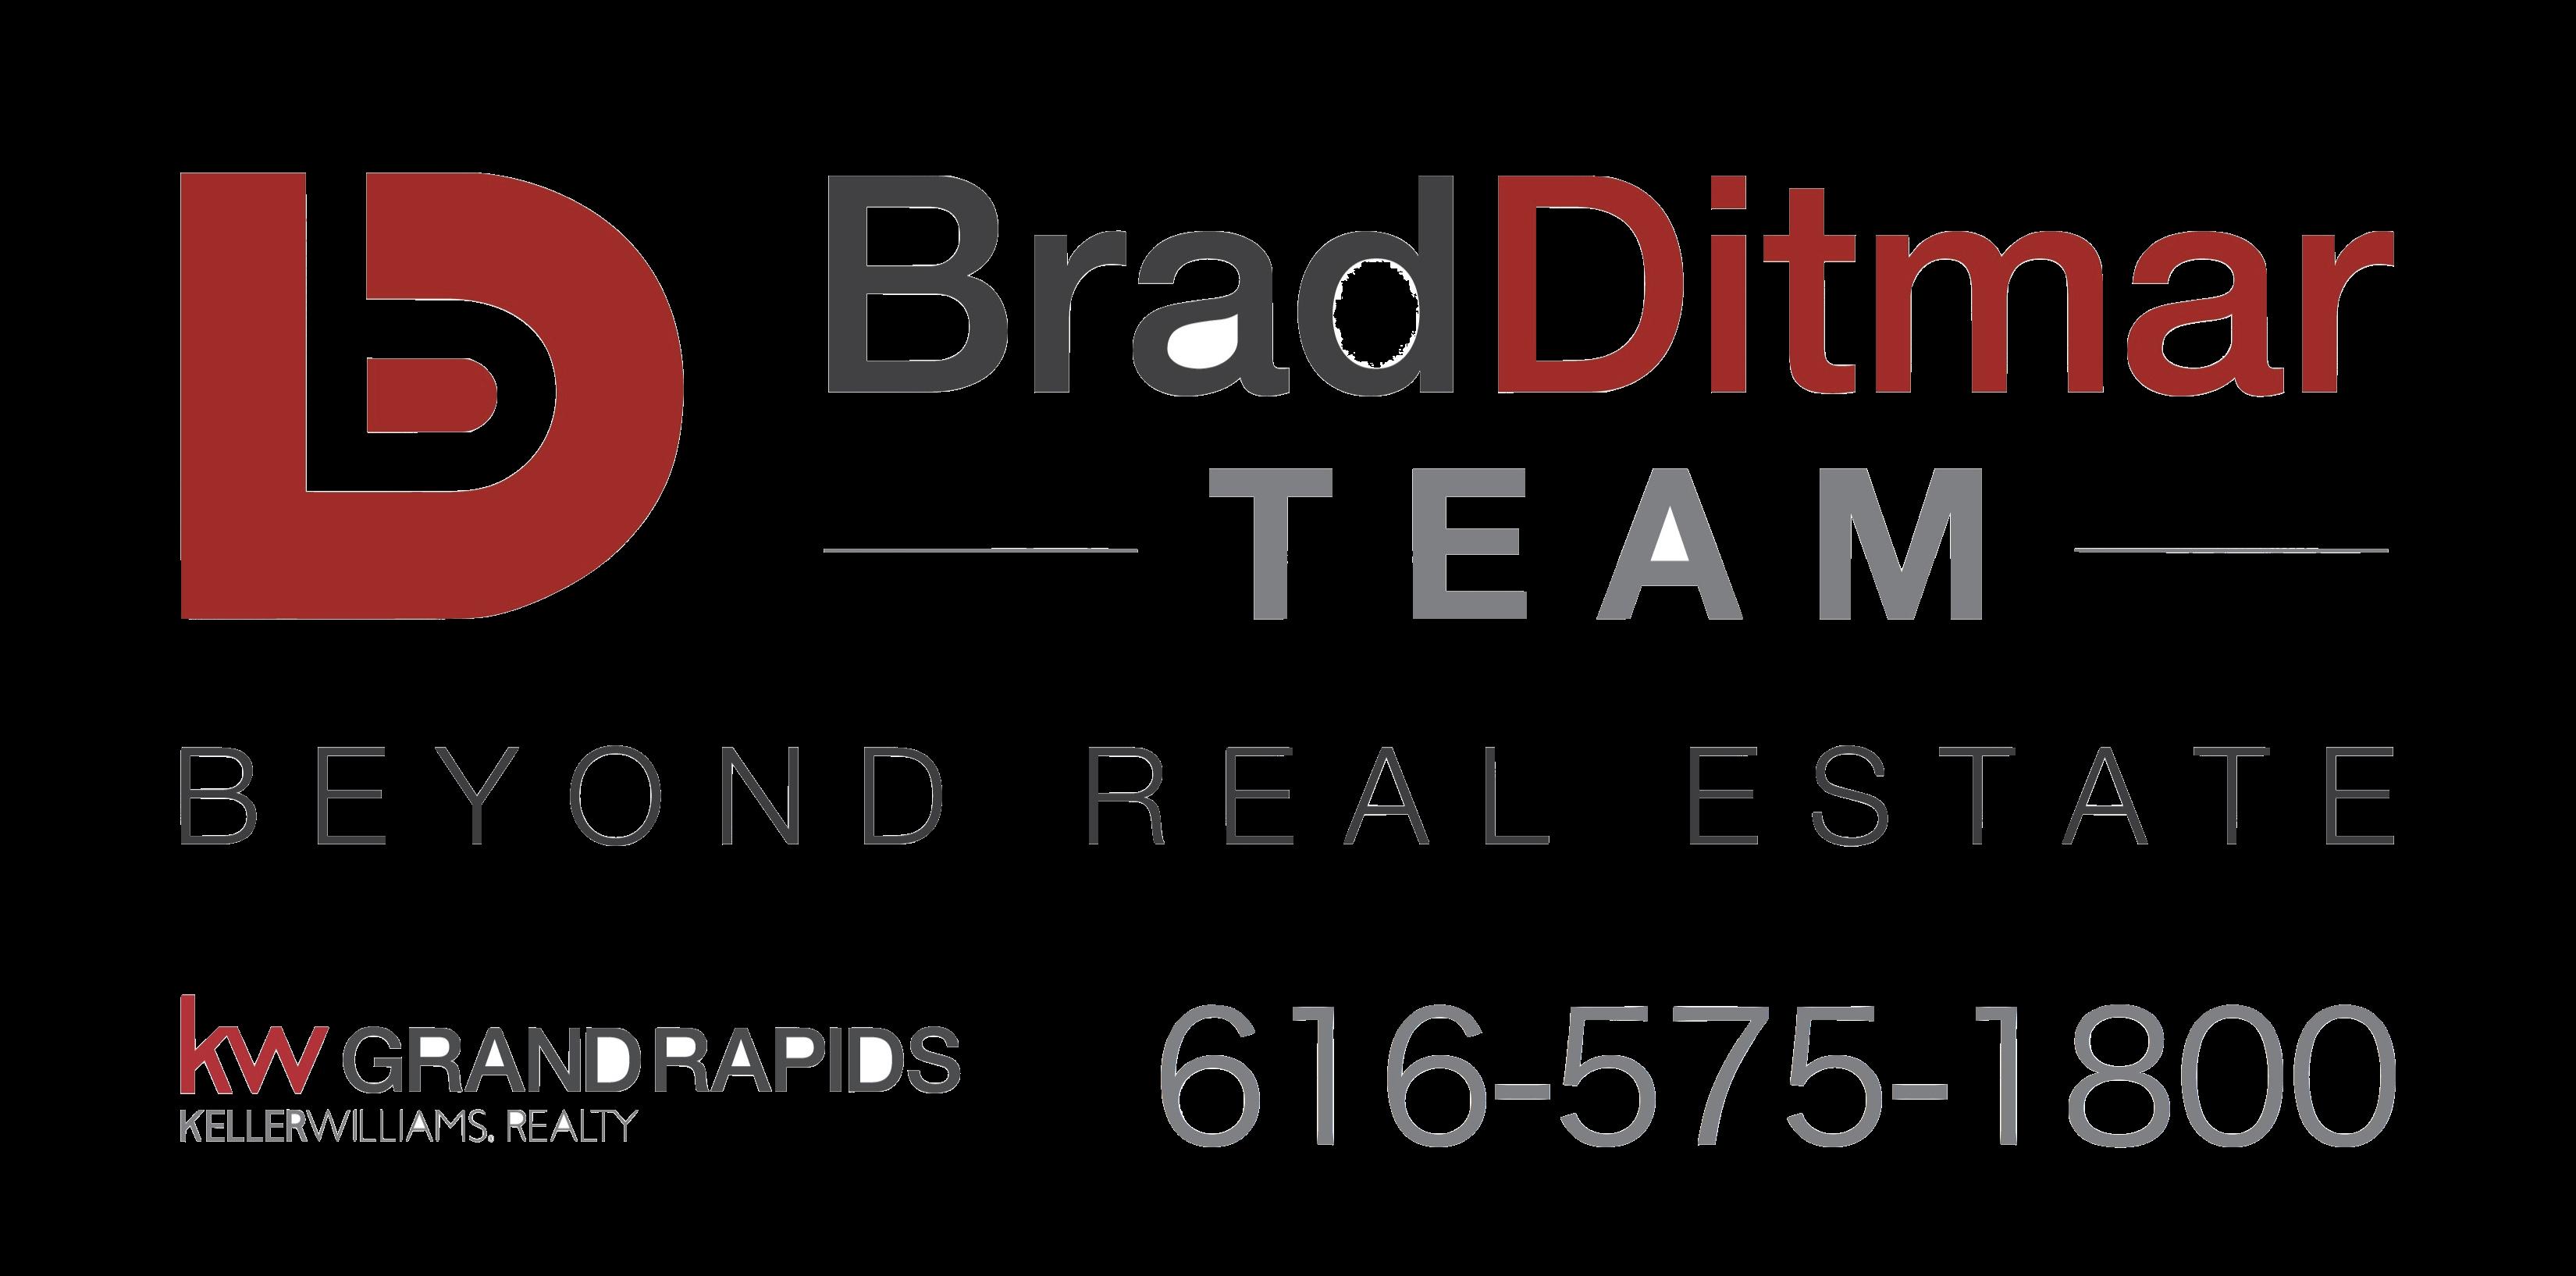 Brad Ditmar Team